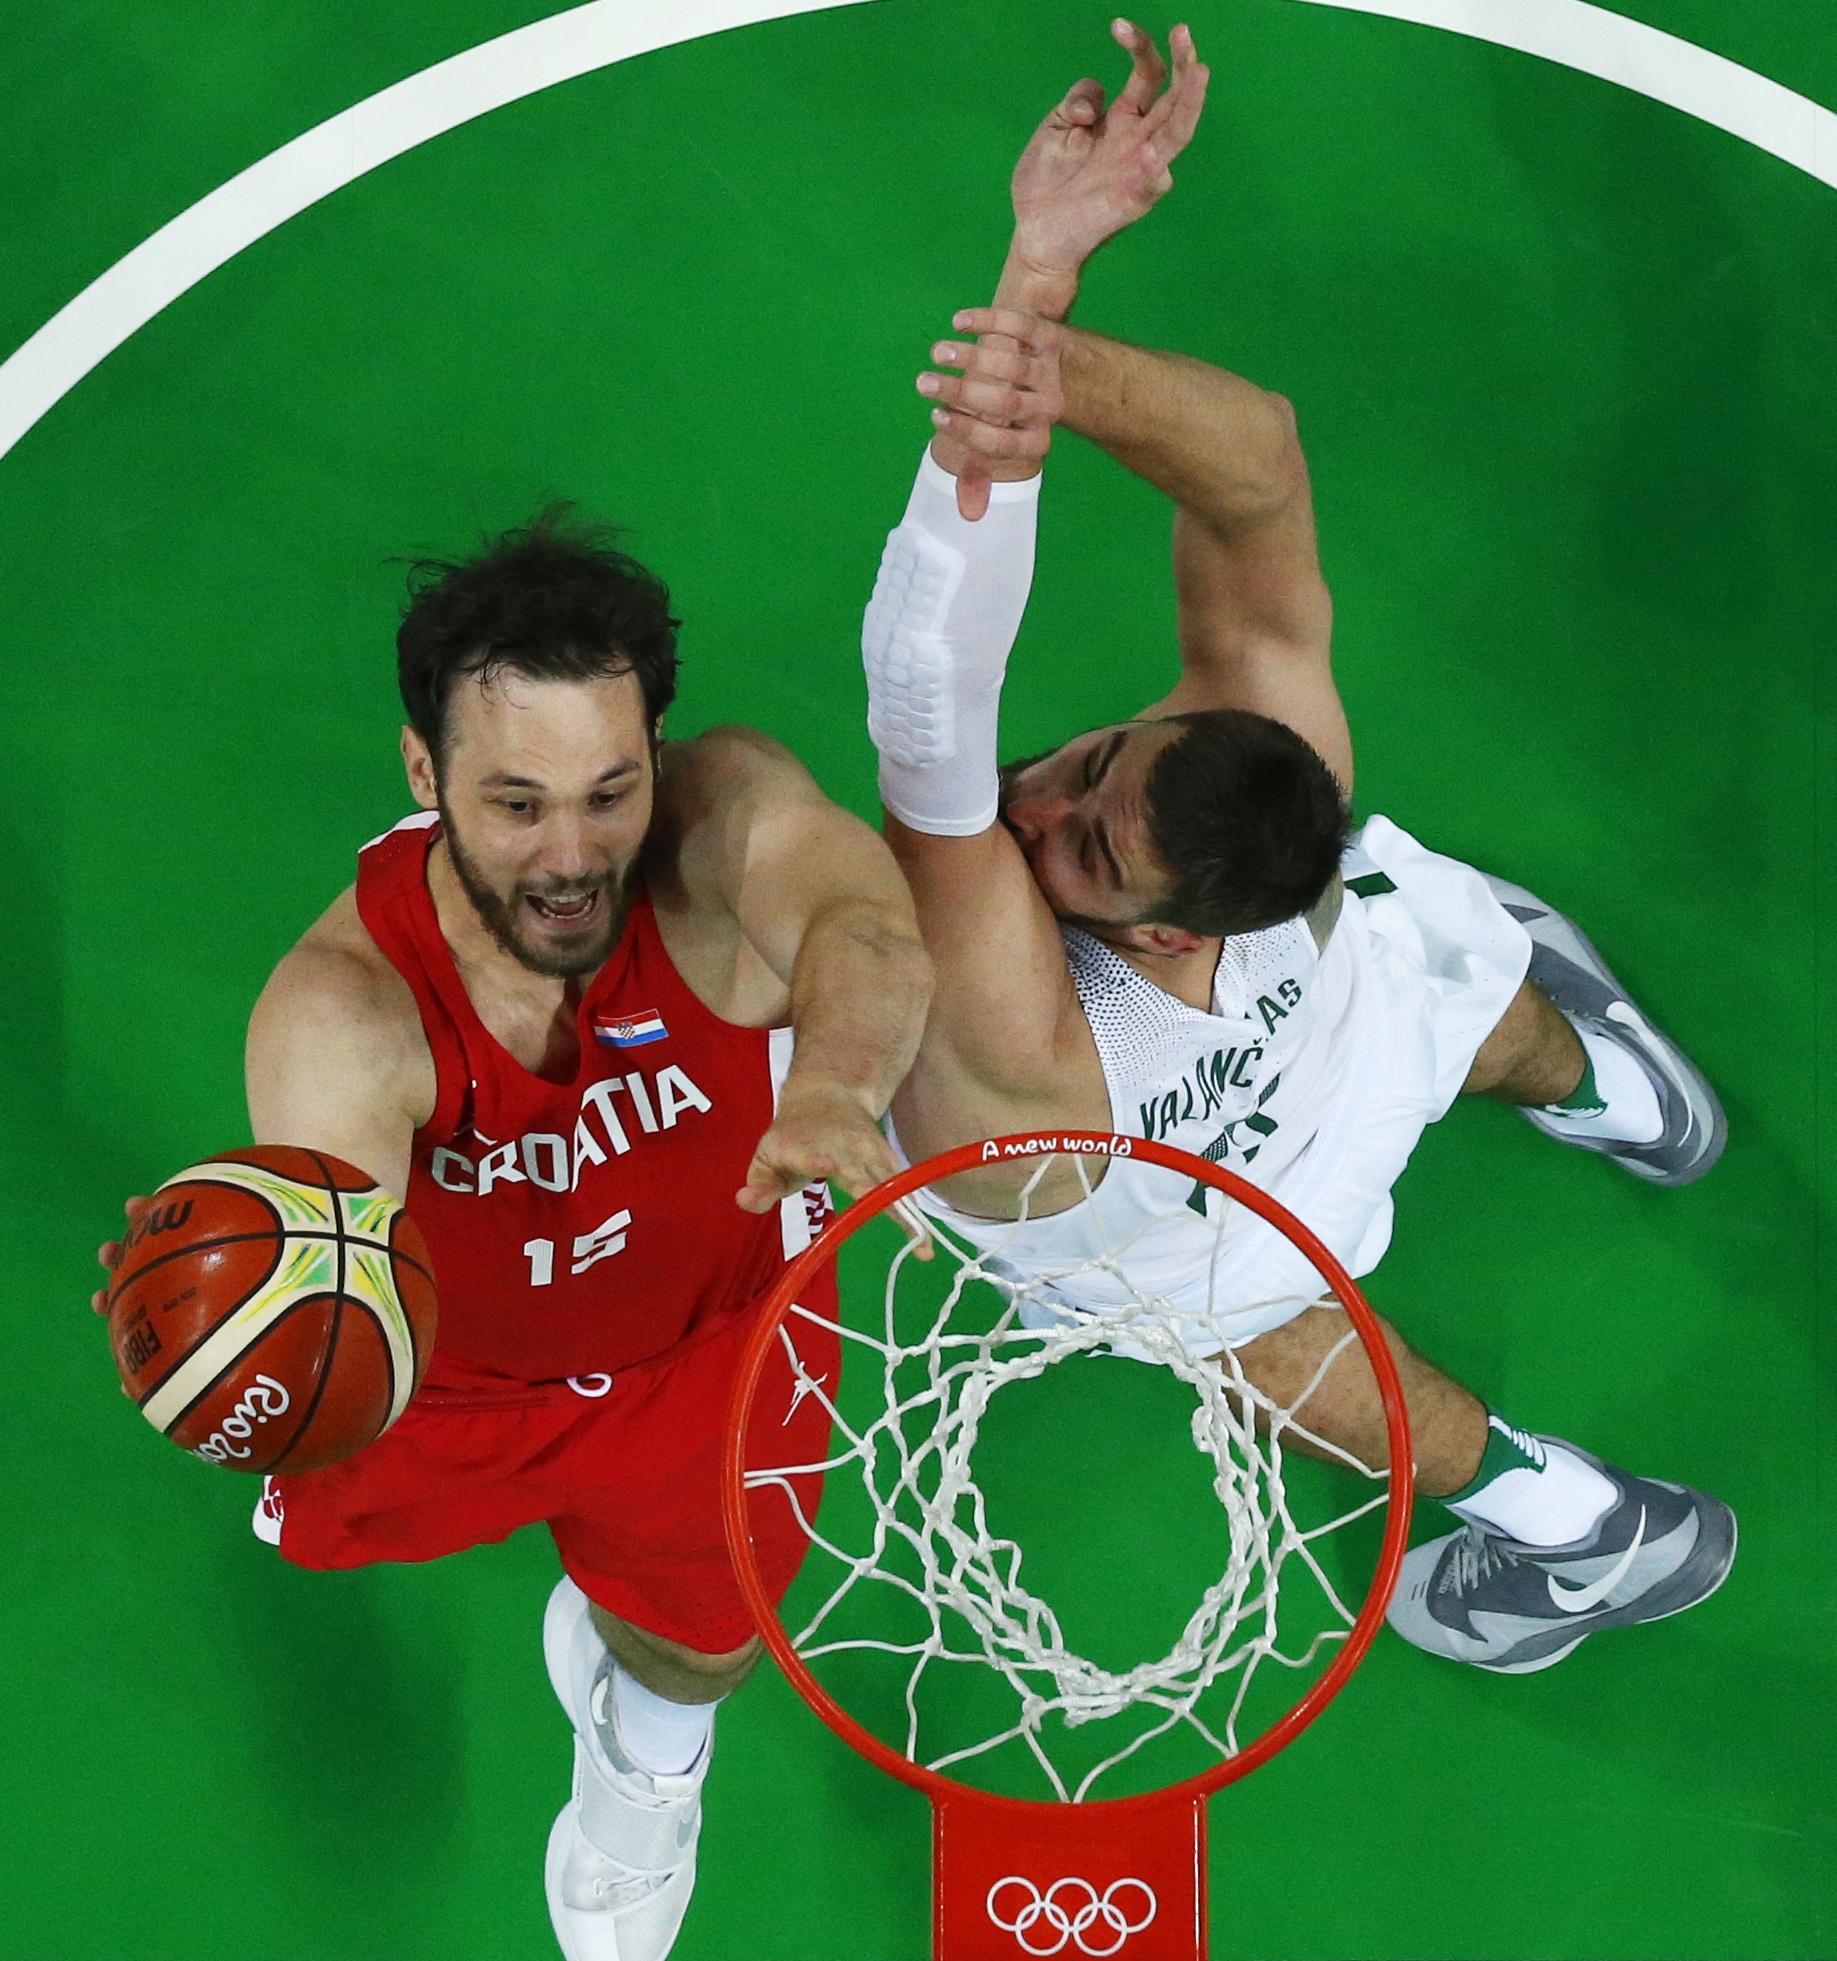 Croatia's Miro Bilan, left, shoots over Lithuania's Jonas Valanciunas, right, during a basketball game at the 2016 Summer Olympics in Rio de Janeiro, Brazil, Monday, Aug. 15, 2016. (Jim Young/Pool Photo via AP)